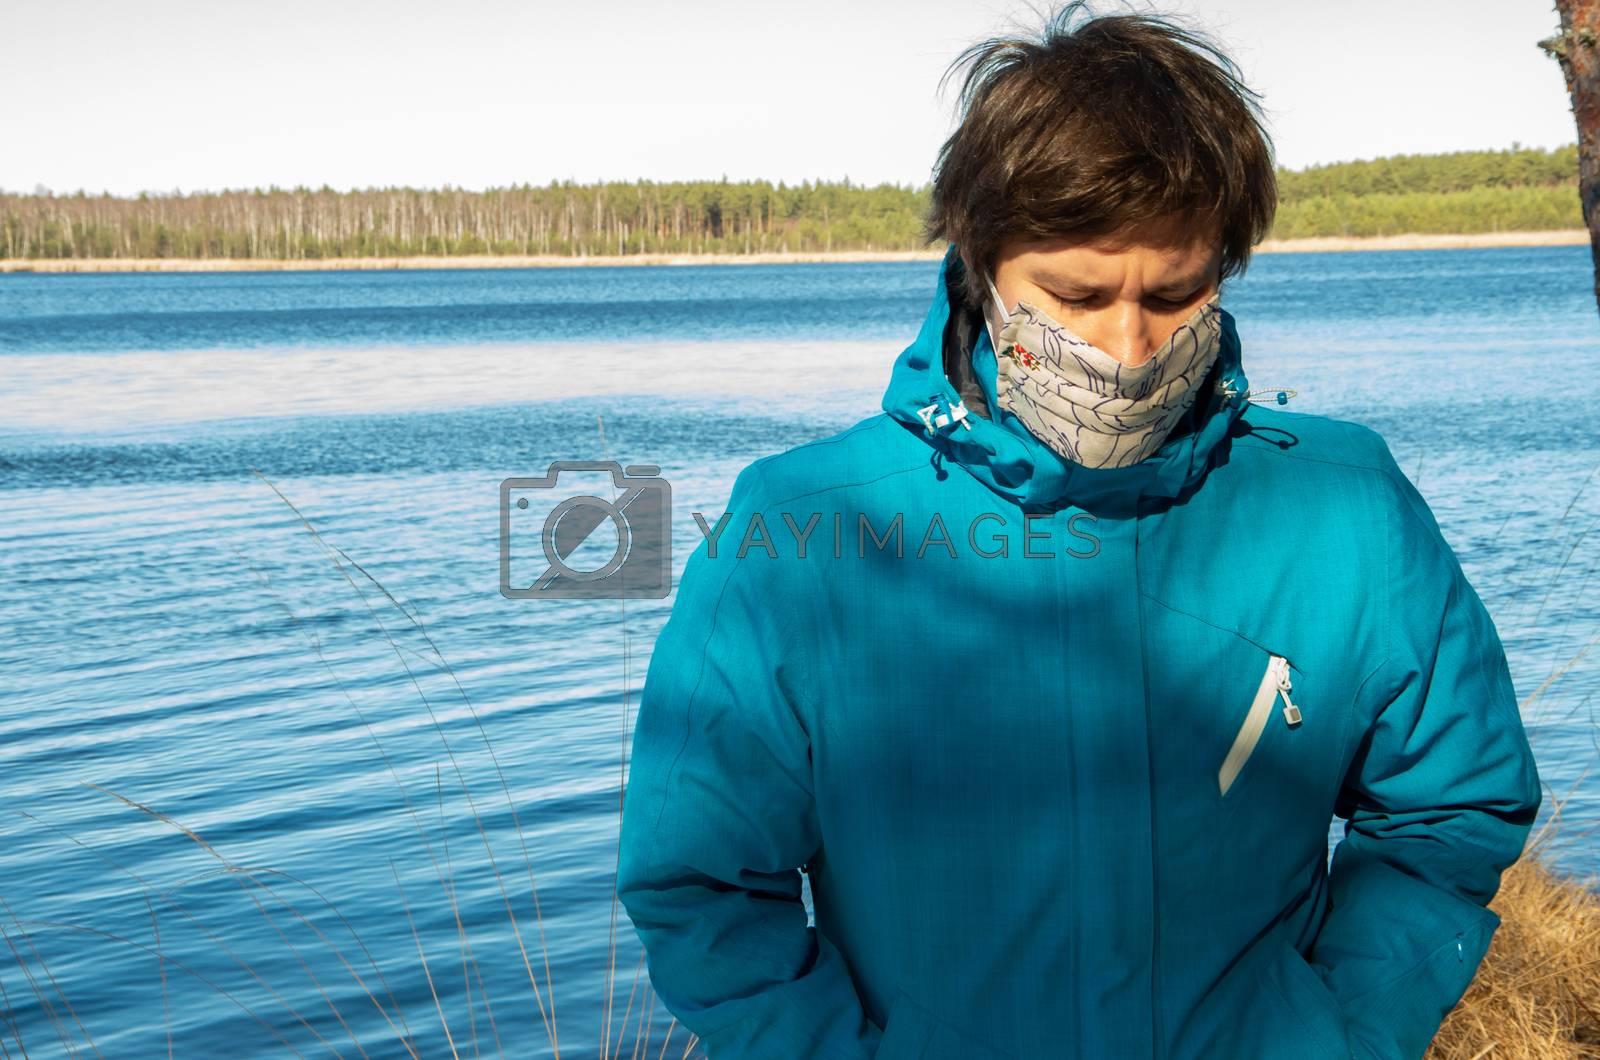 Virus, man with white face mask in a blue jacket, coronavirus, COVID-19, lake